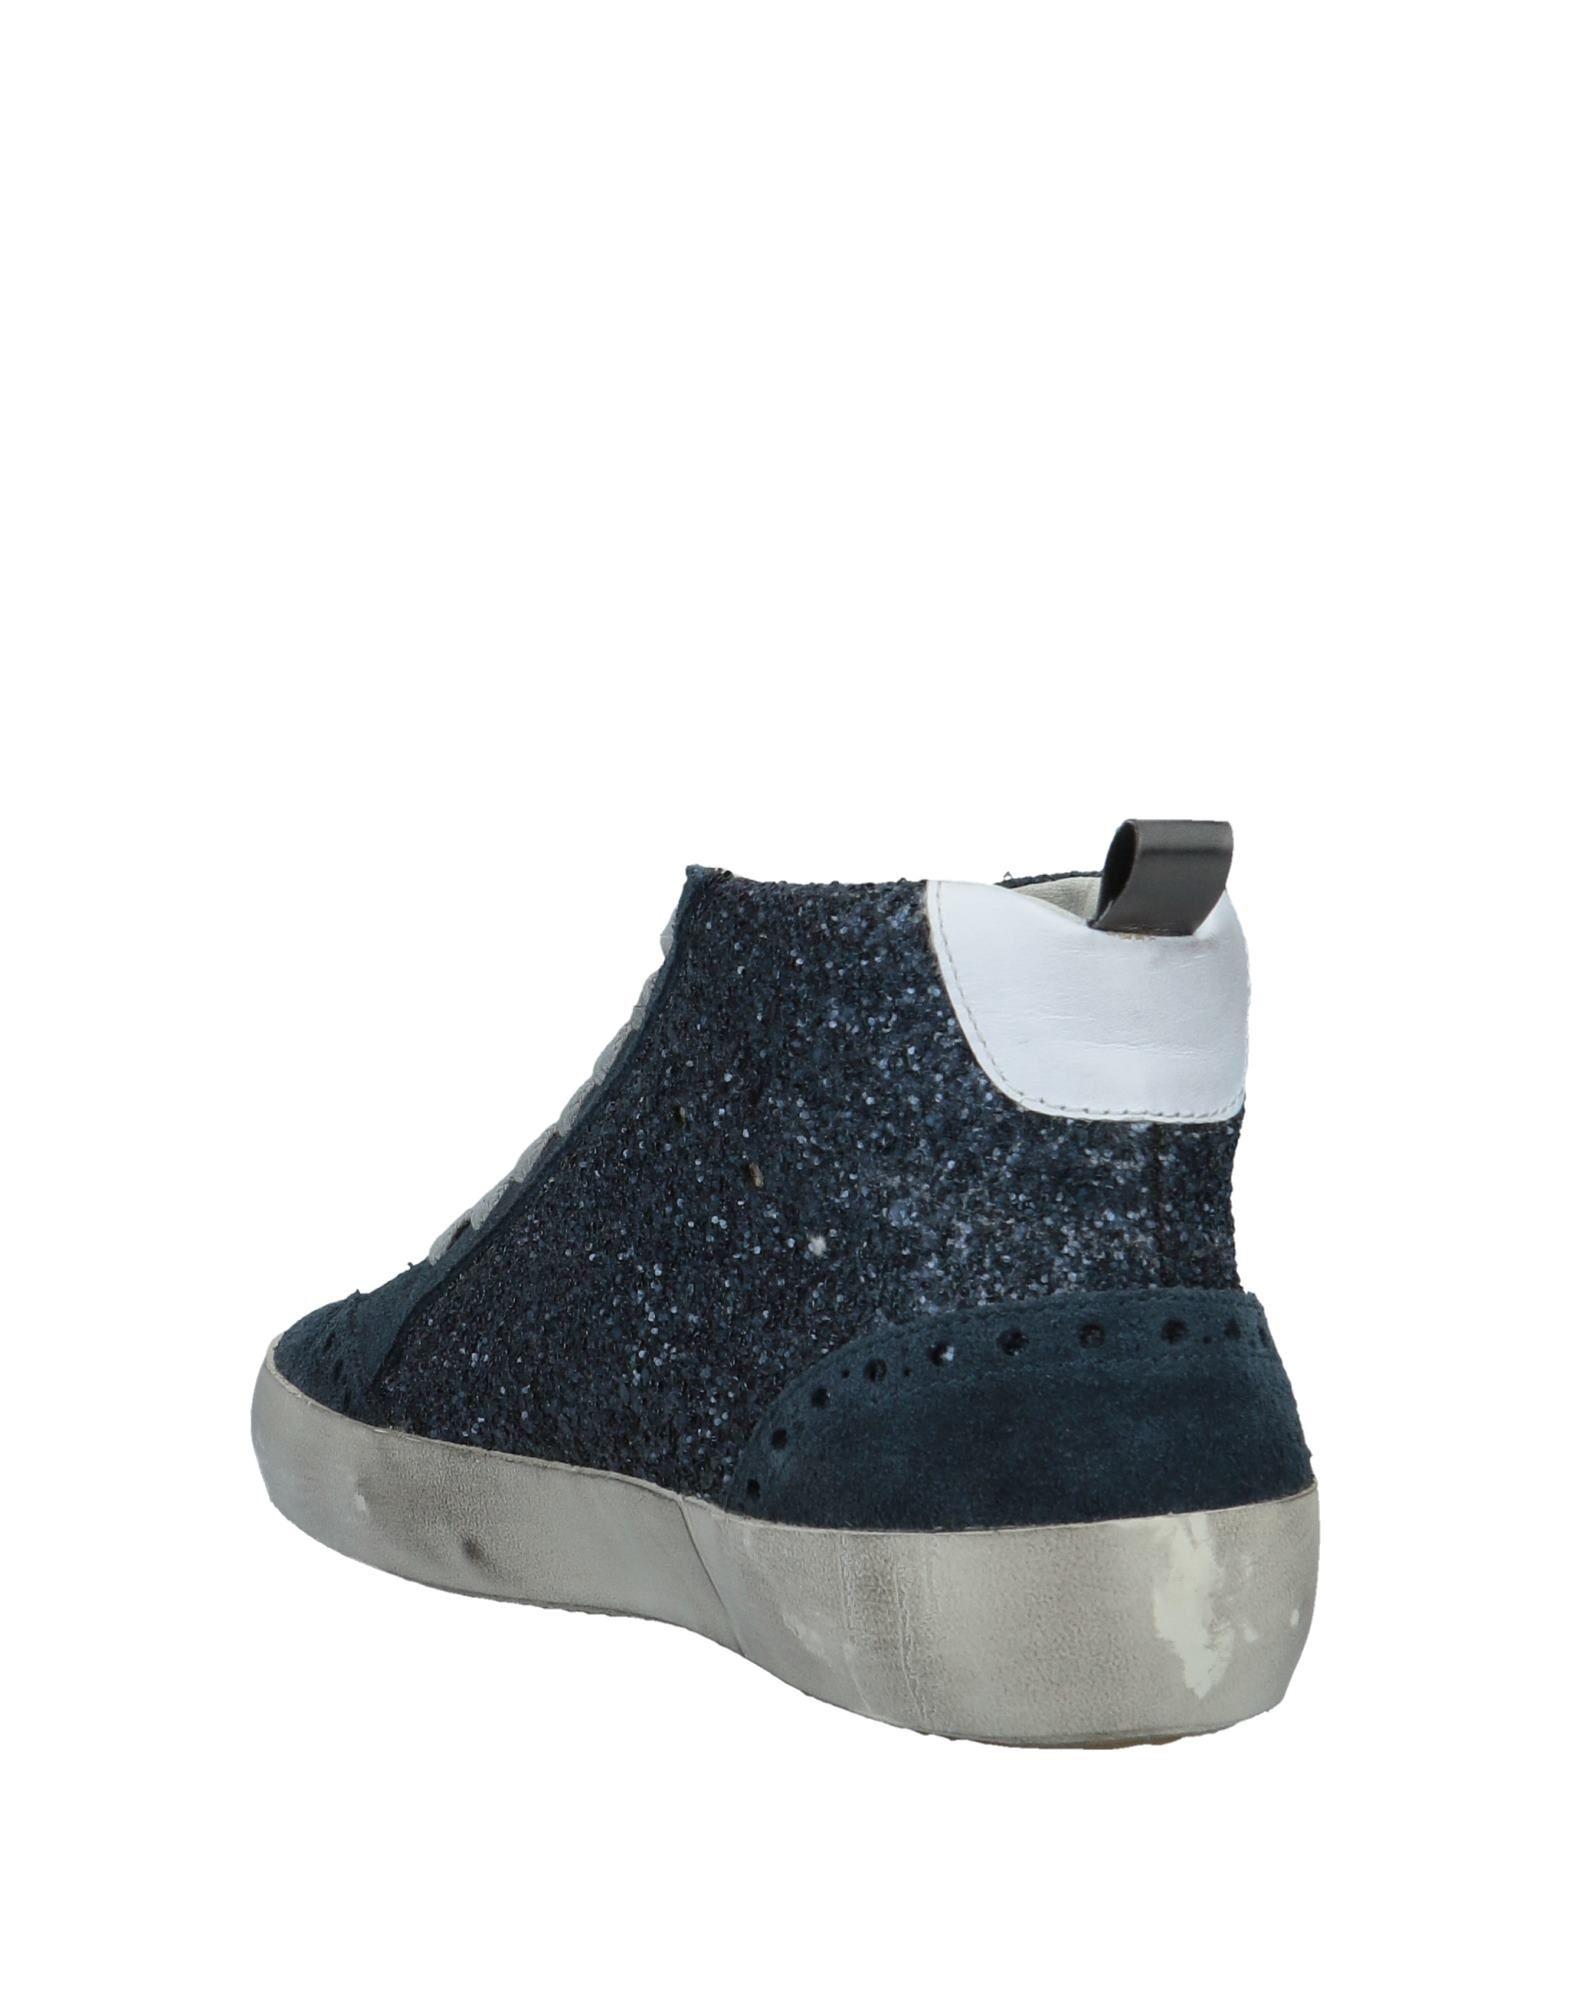 Quattrobarradodici Sneakers Damen 11546503JJ  11546503JJ Damen Gute Qualität beliebte Schuhe 6c49cf